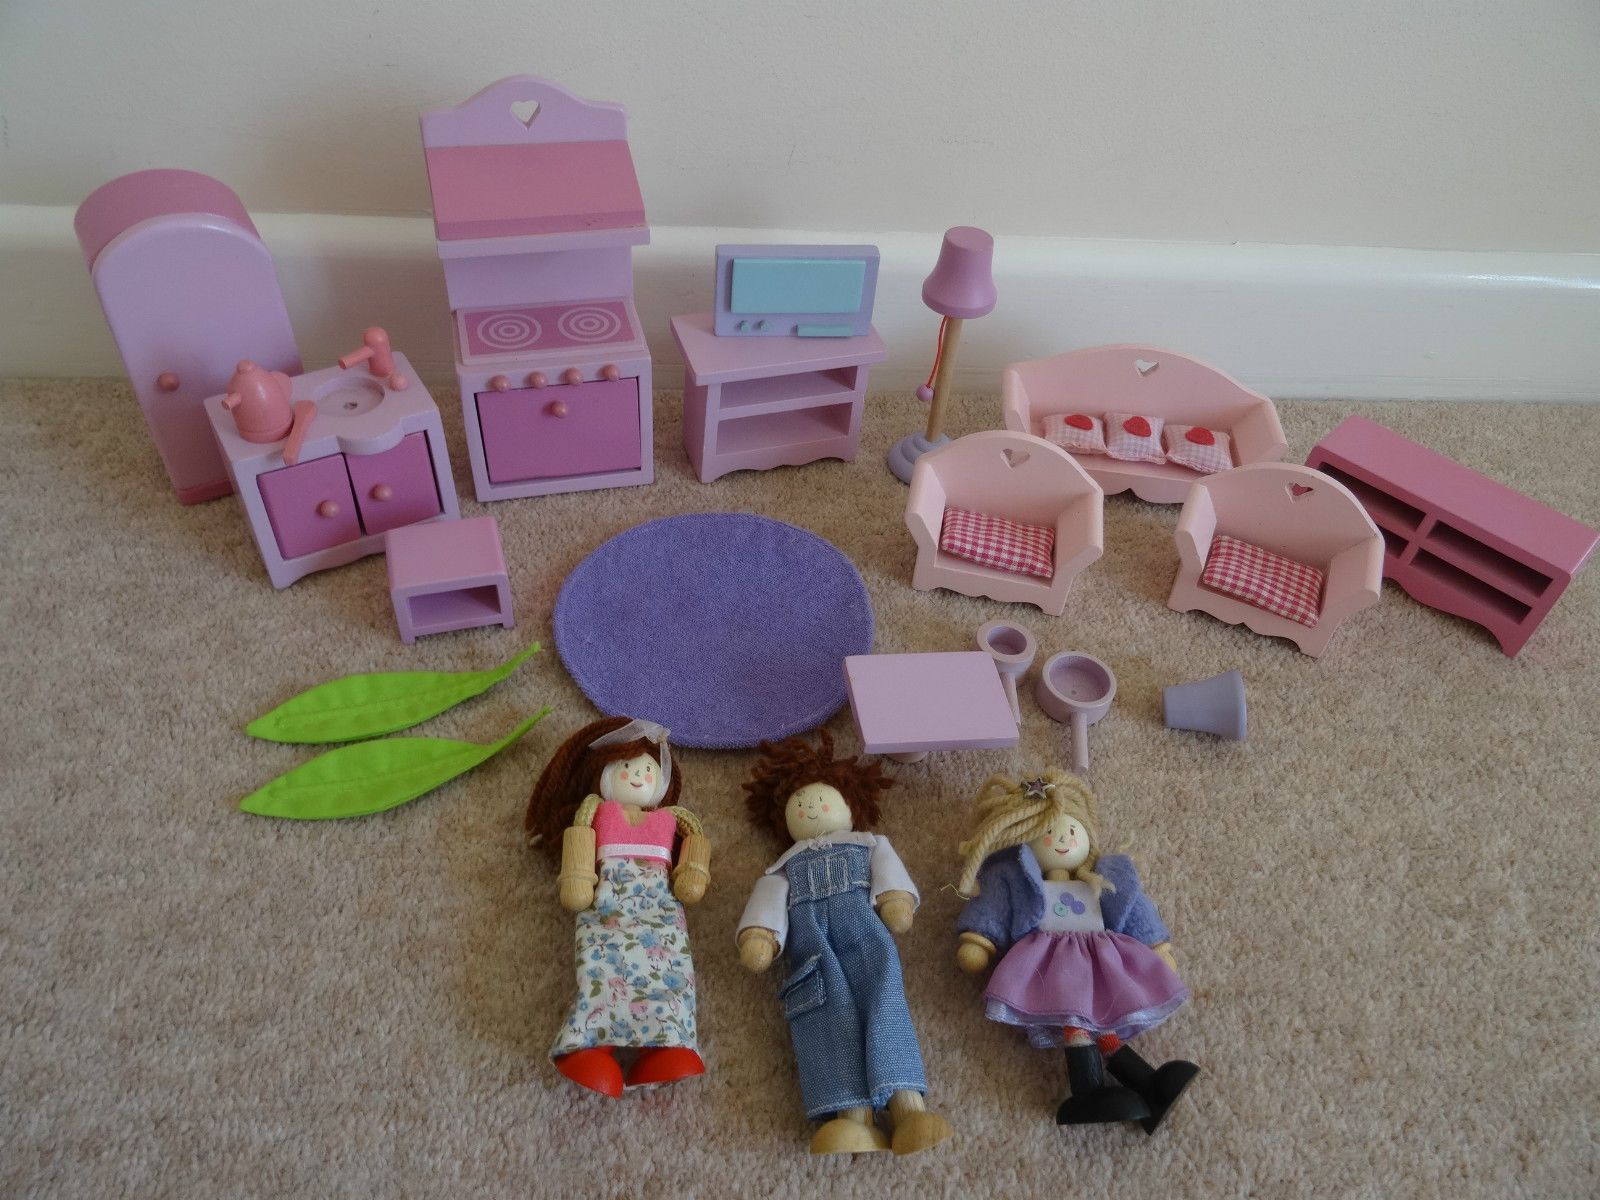 elc wooden dolls house furniture people figures kitchen living